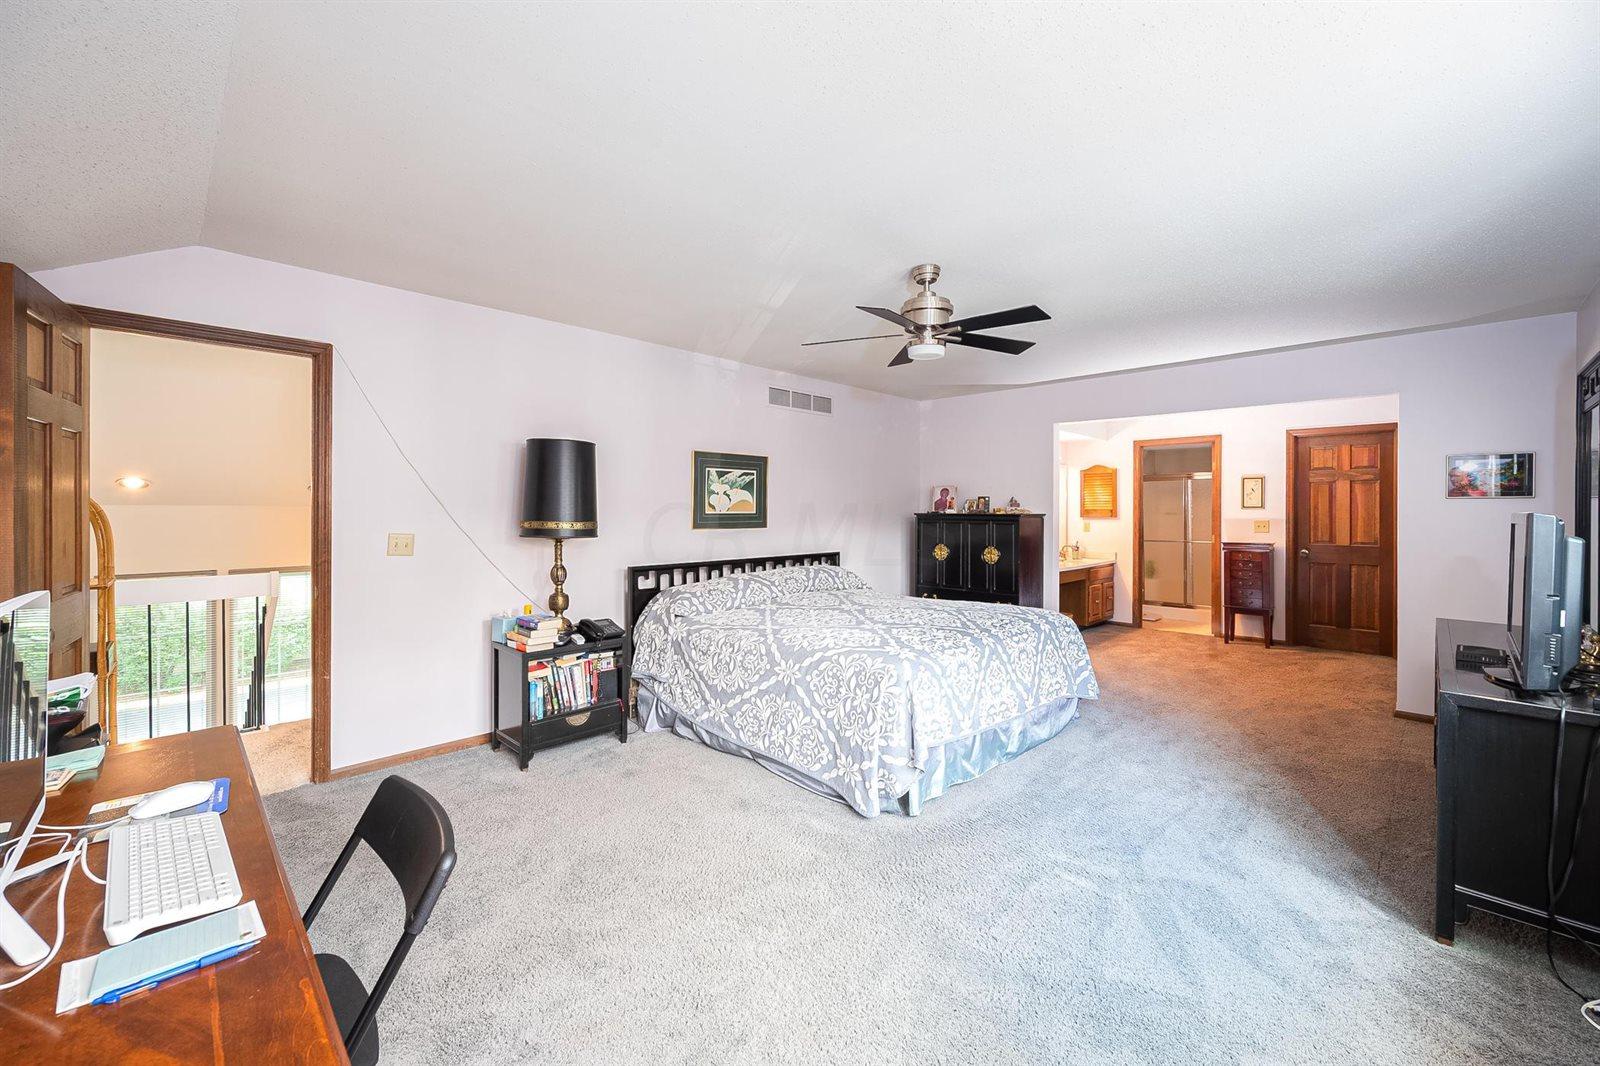 116 Saint Andre Street, #8B-D, Worthington, OH 43085